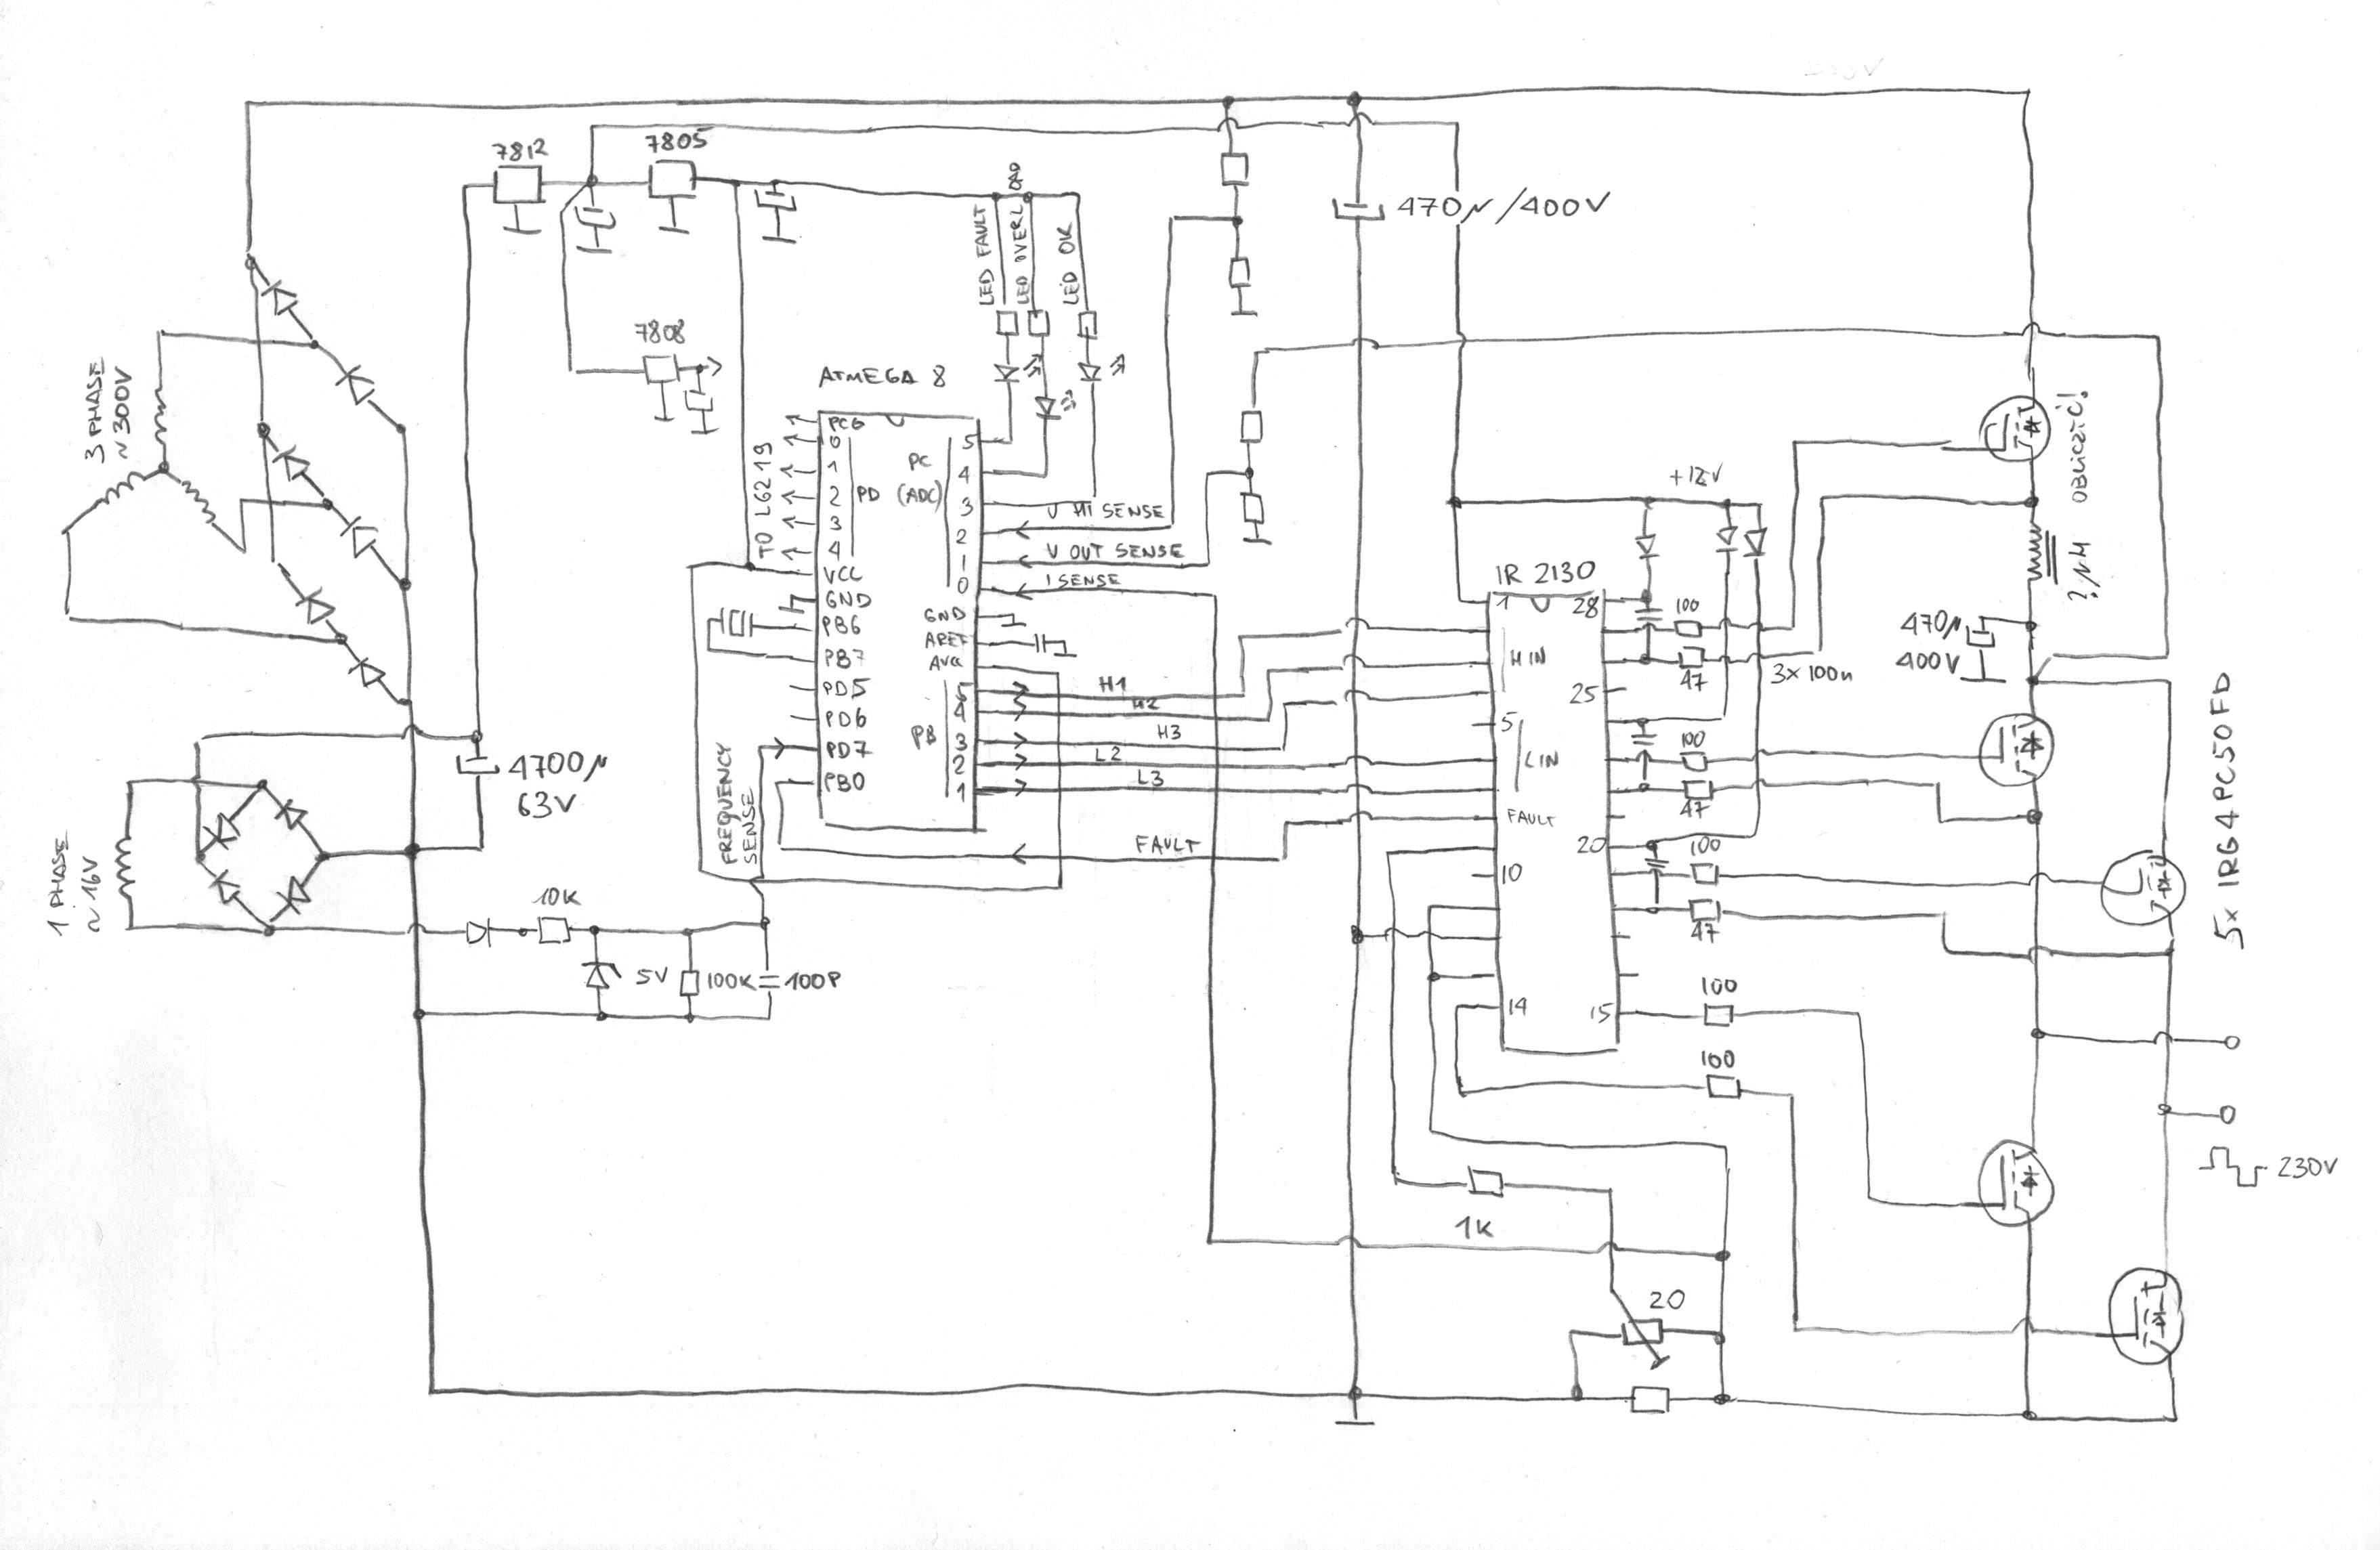 100 Ingersoll Rand Compressor Parts Diagram – Ingersoll Rand T30 Wiring-diagram